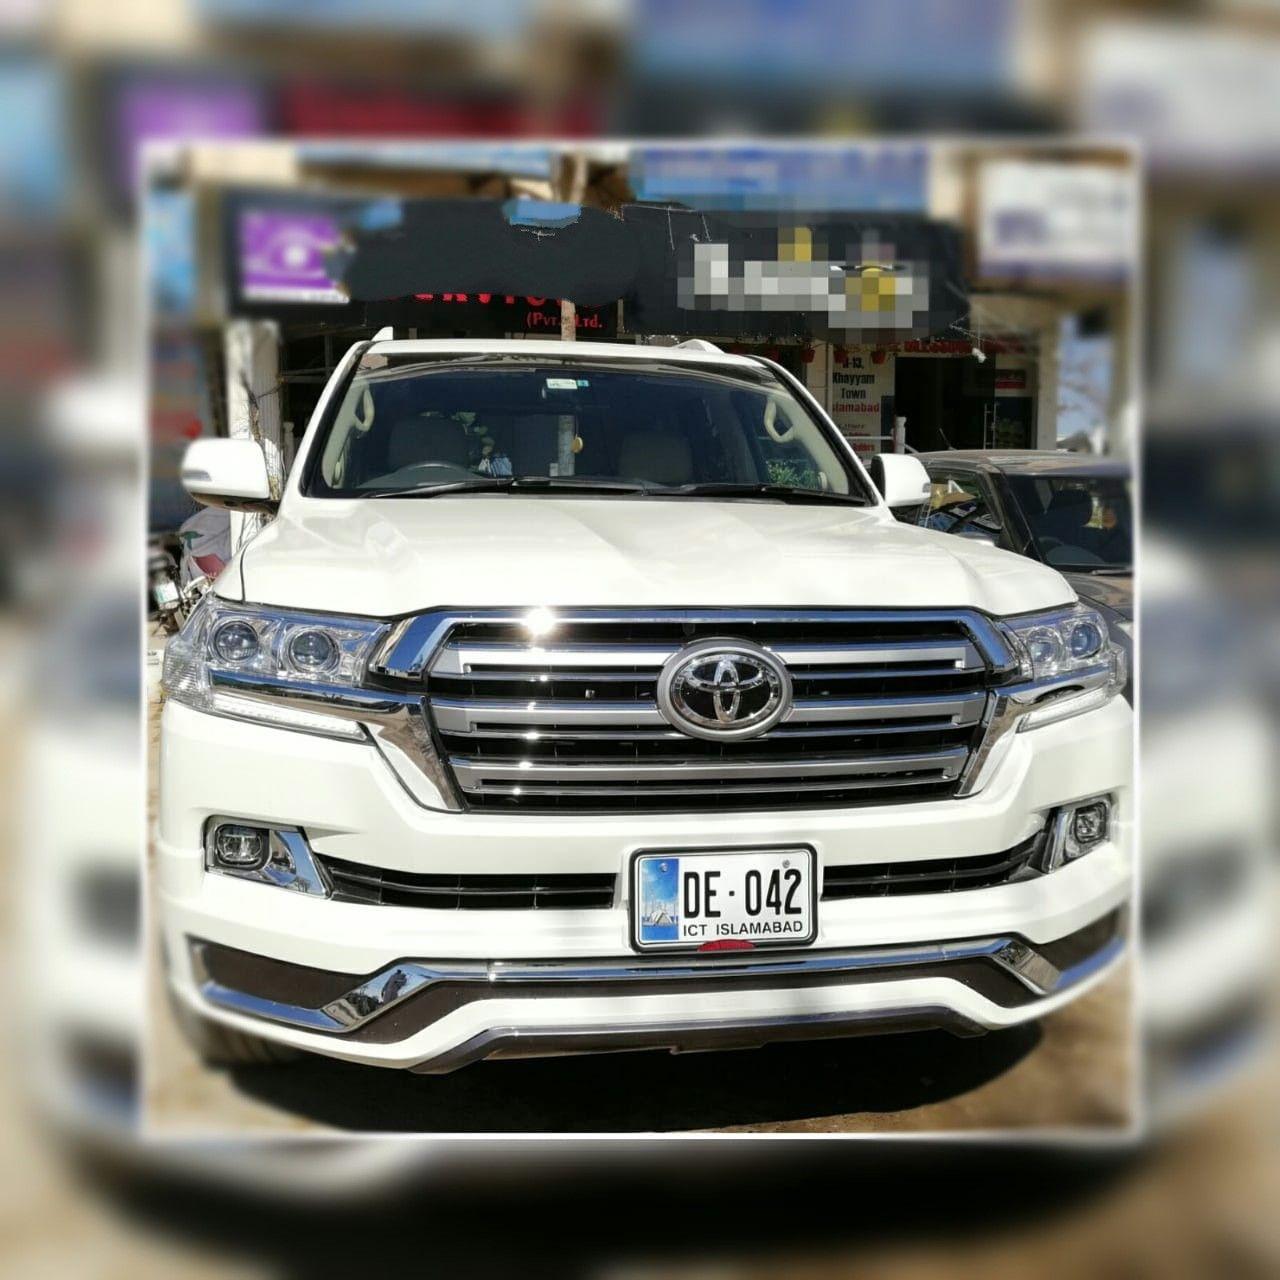 Haxn rent a car rawalpindi islamabad pakistan car rental